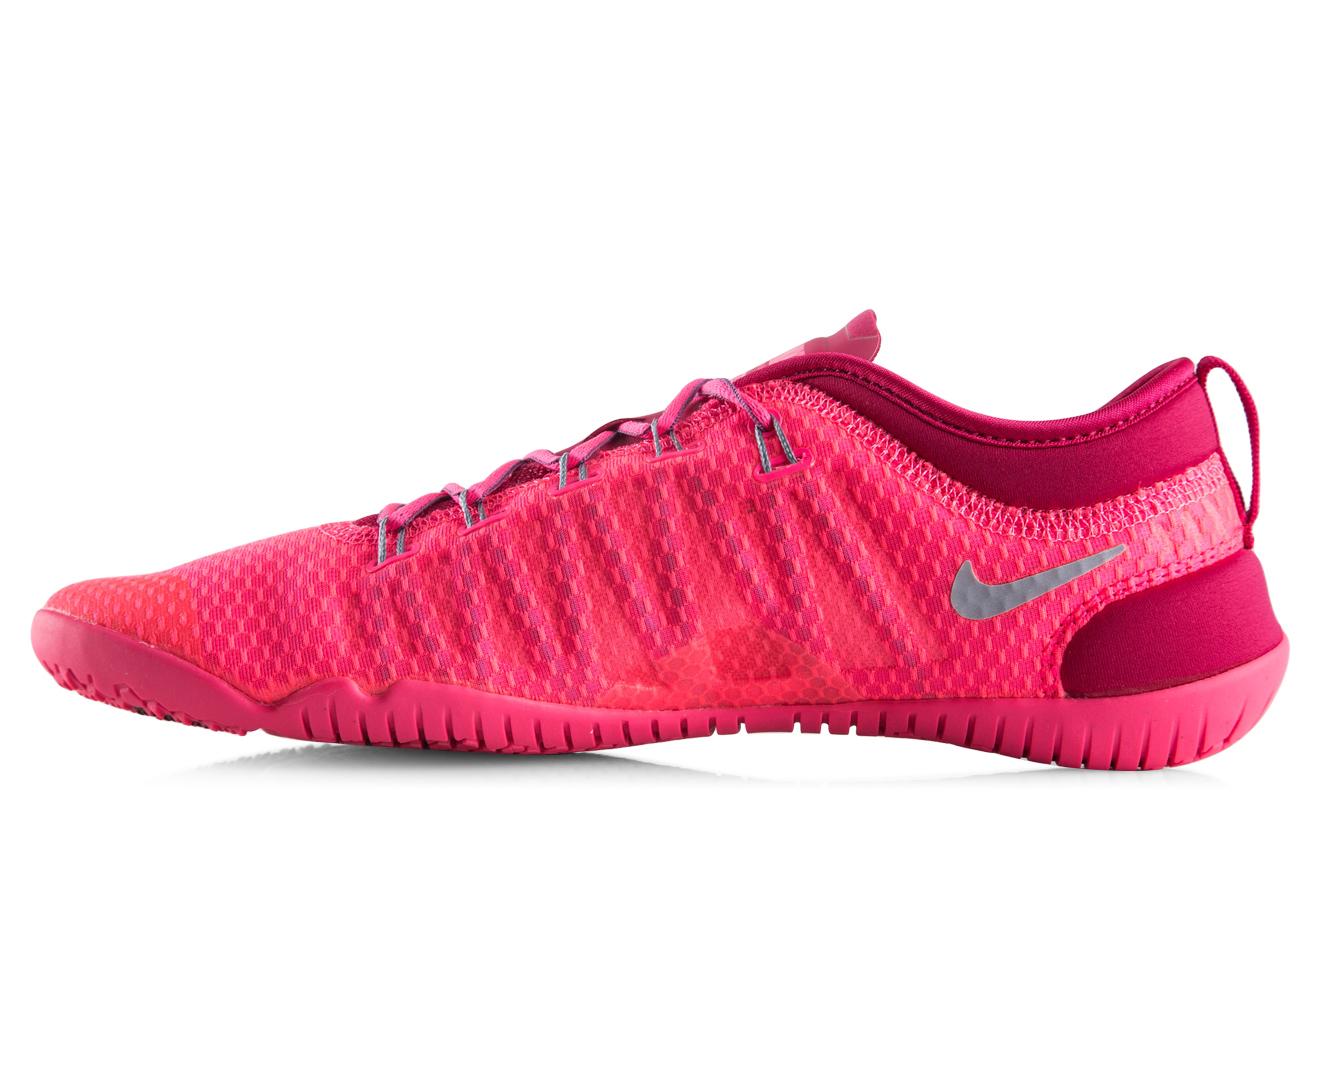 best cheap b193d d66de Nike Women s Free 1.0 Cross Bionic - Pink   Catch.com.au